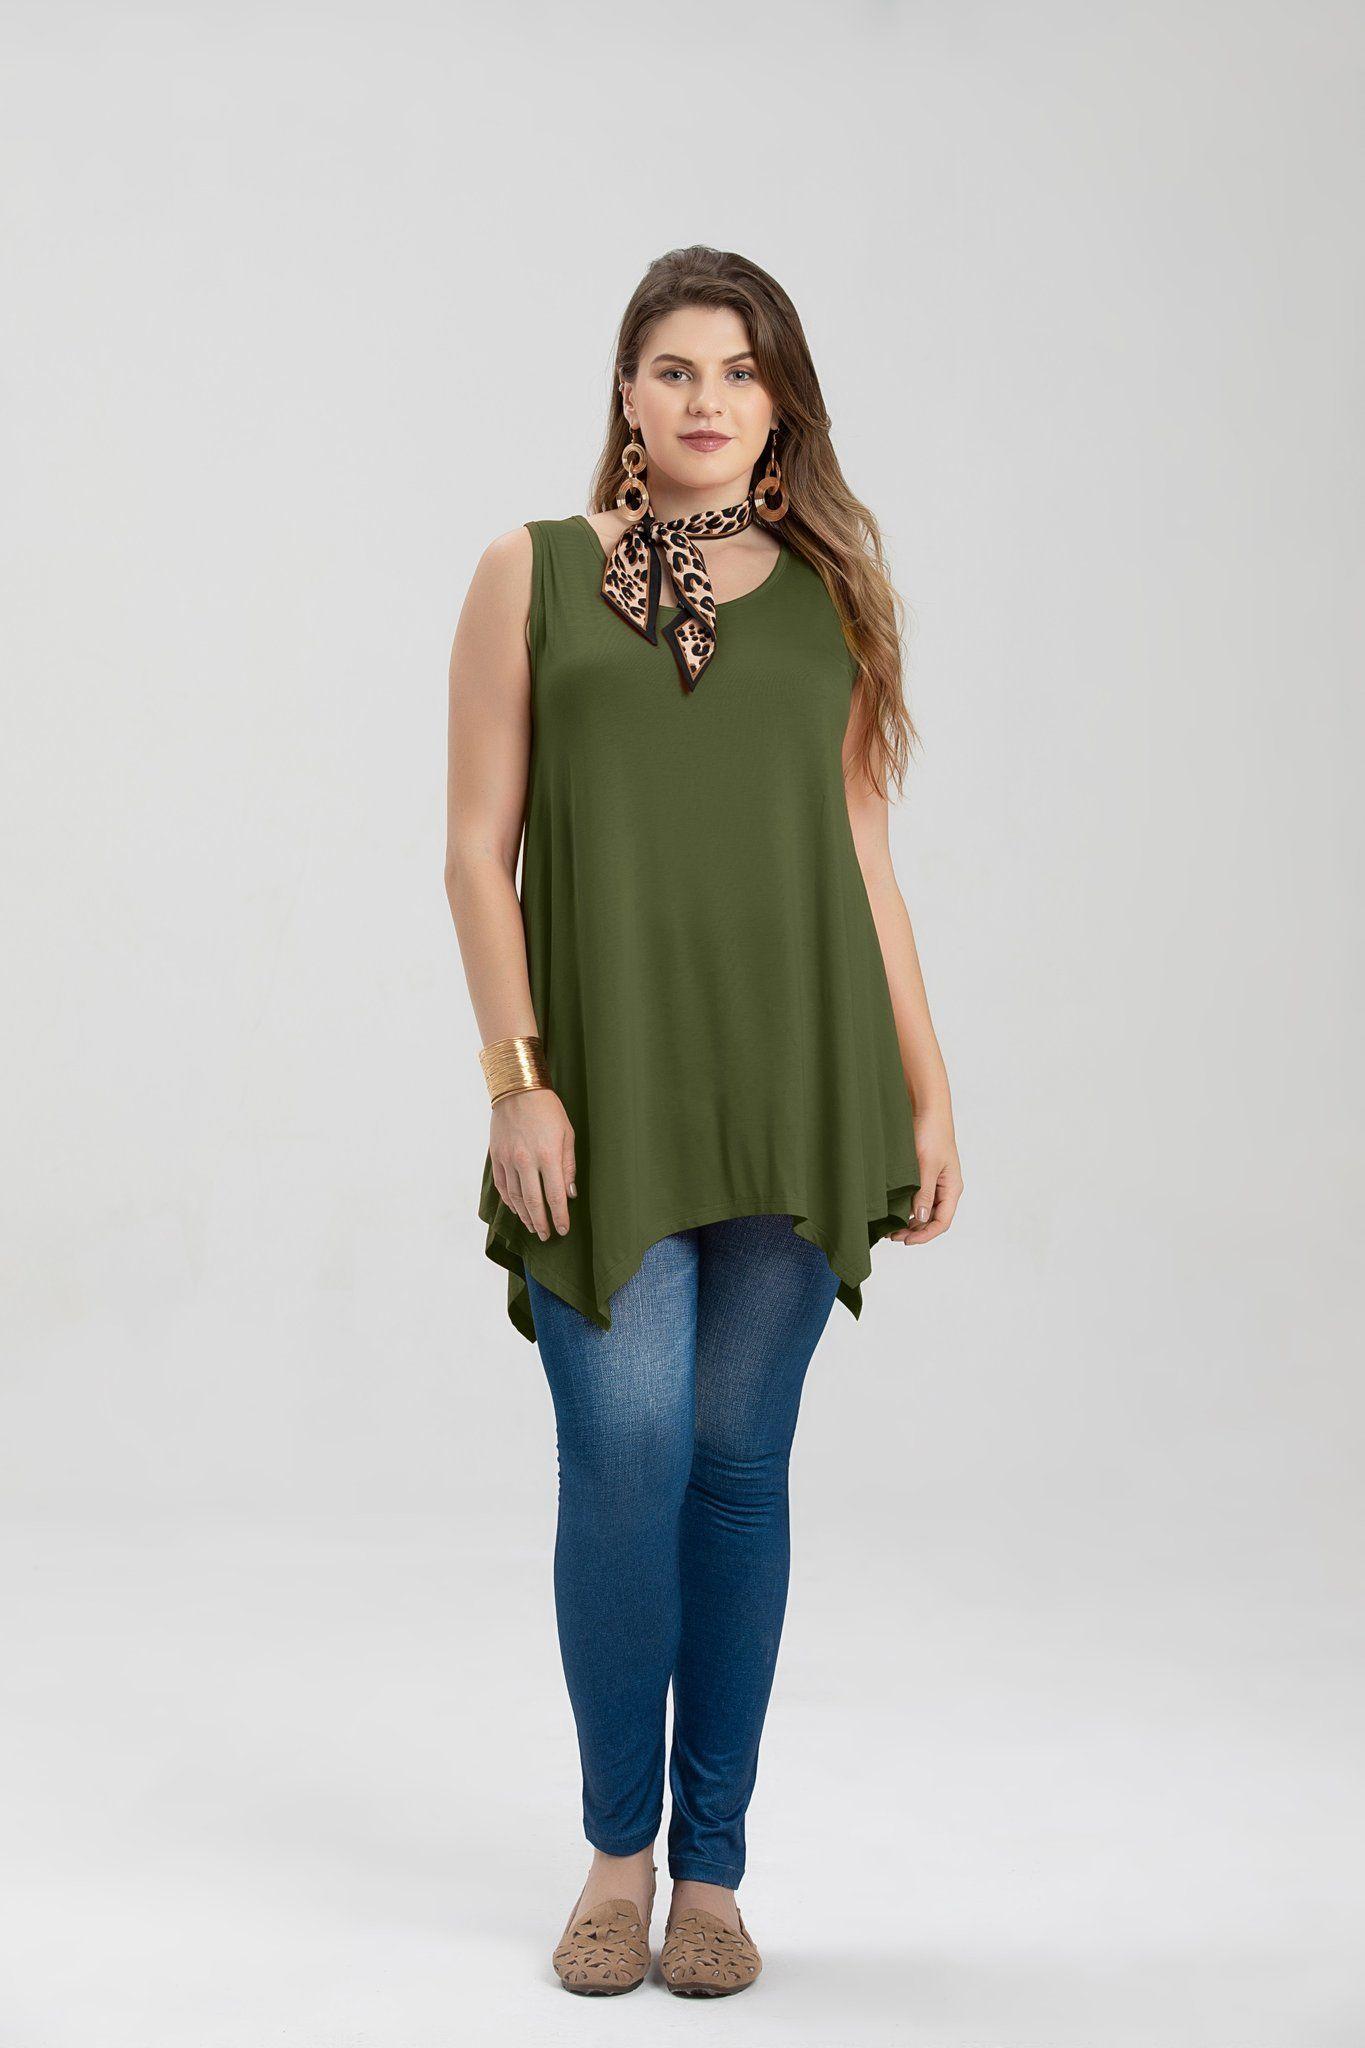 a5600163c71 larace women plus size solid basic flowy tank tops summer sleeveless tunic  ,women's sleeveless tunic tops,long flowy tunic tops,tunic tops for  leggings on ...